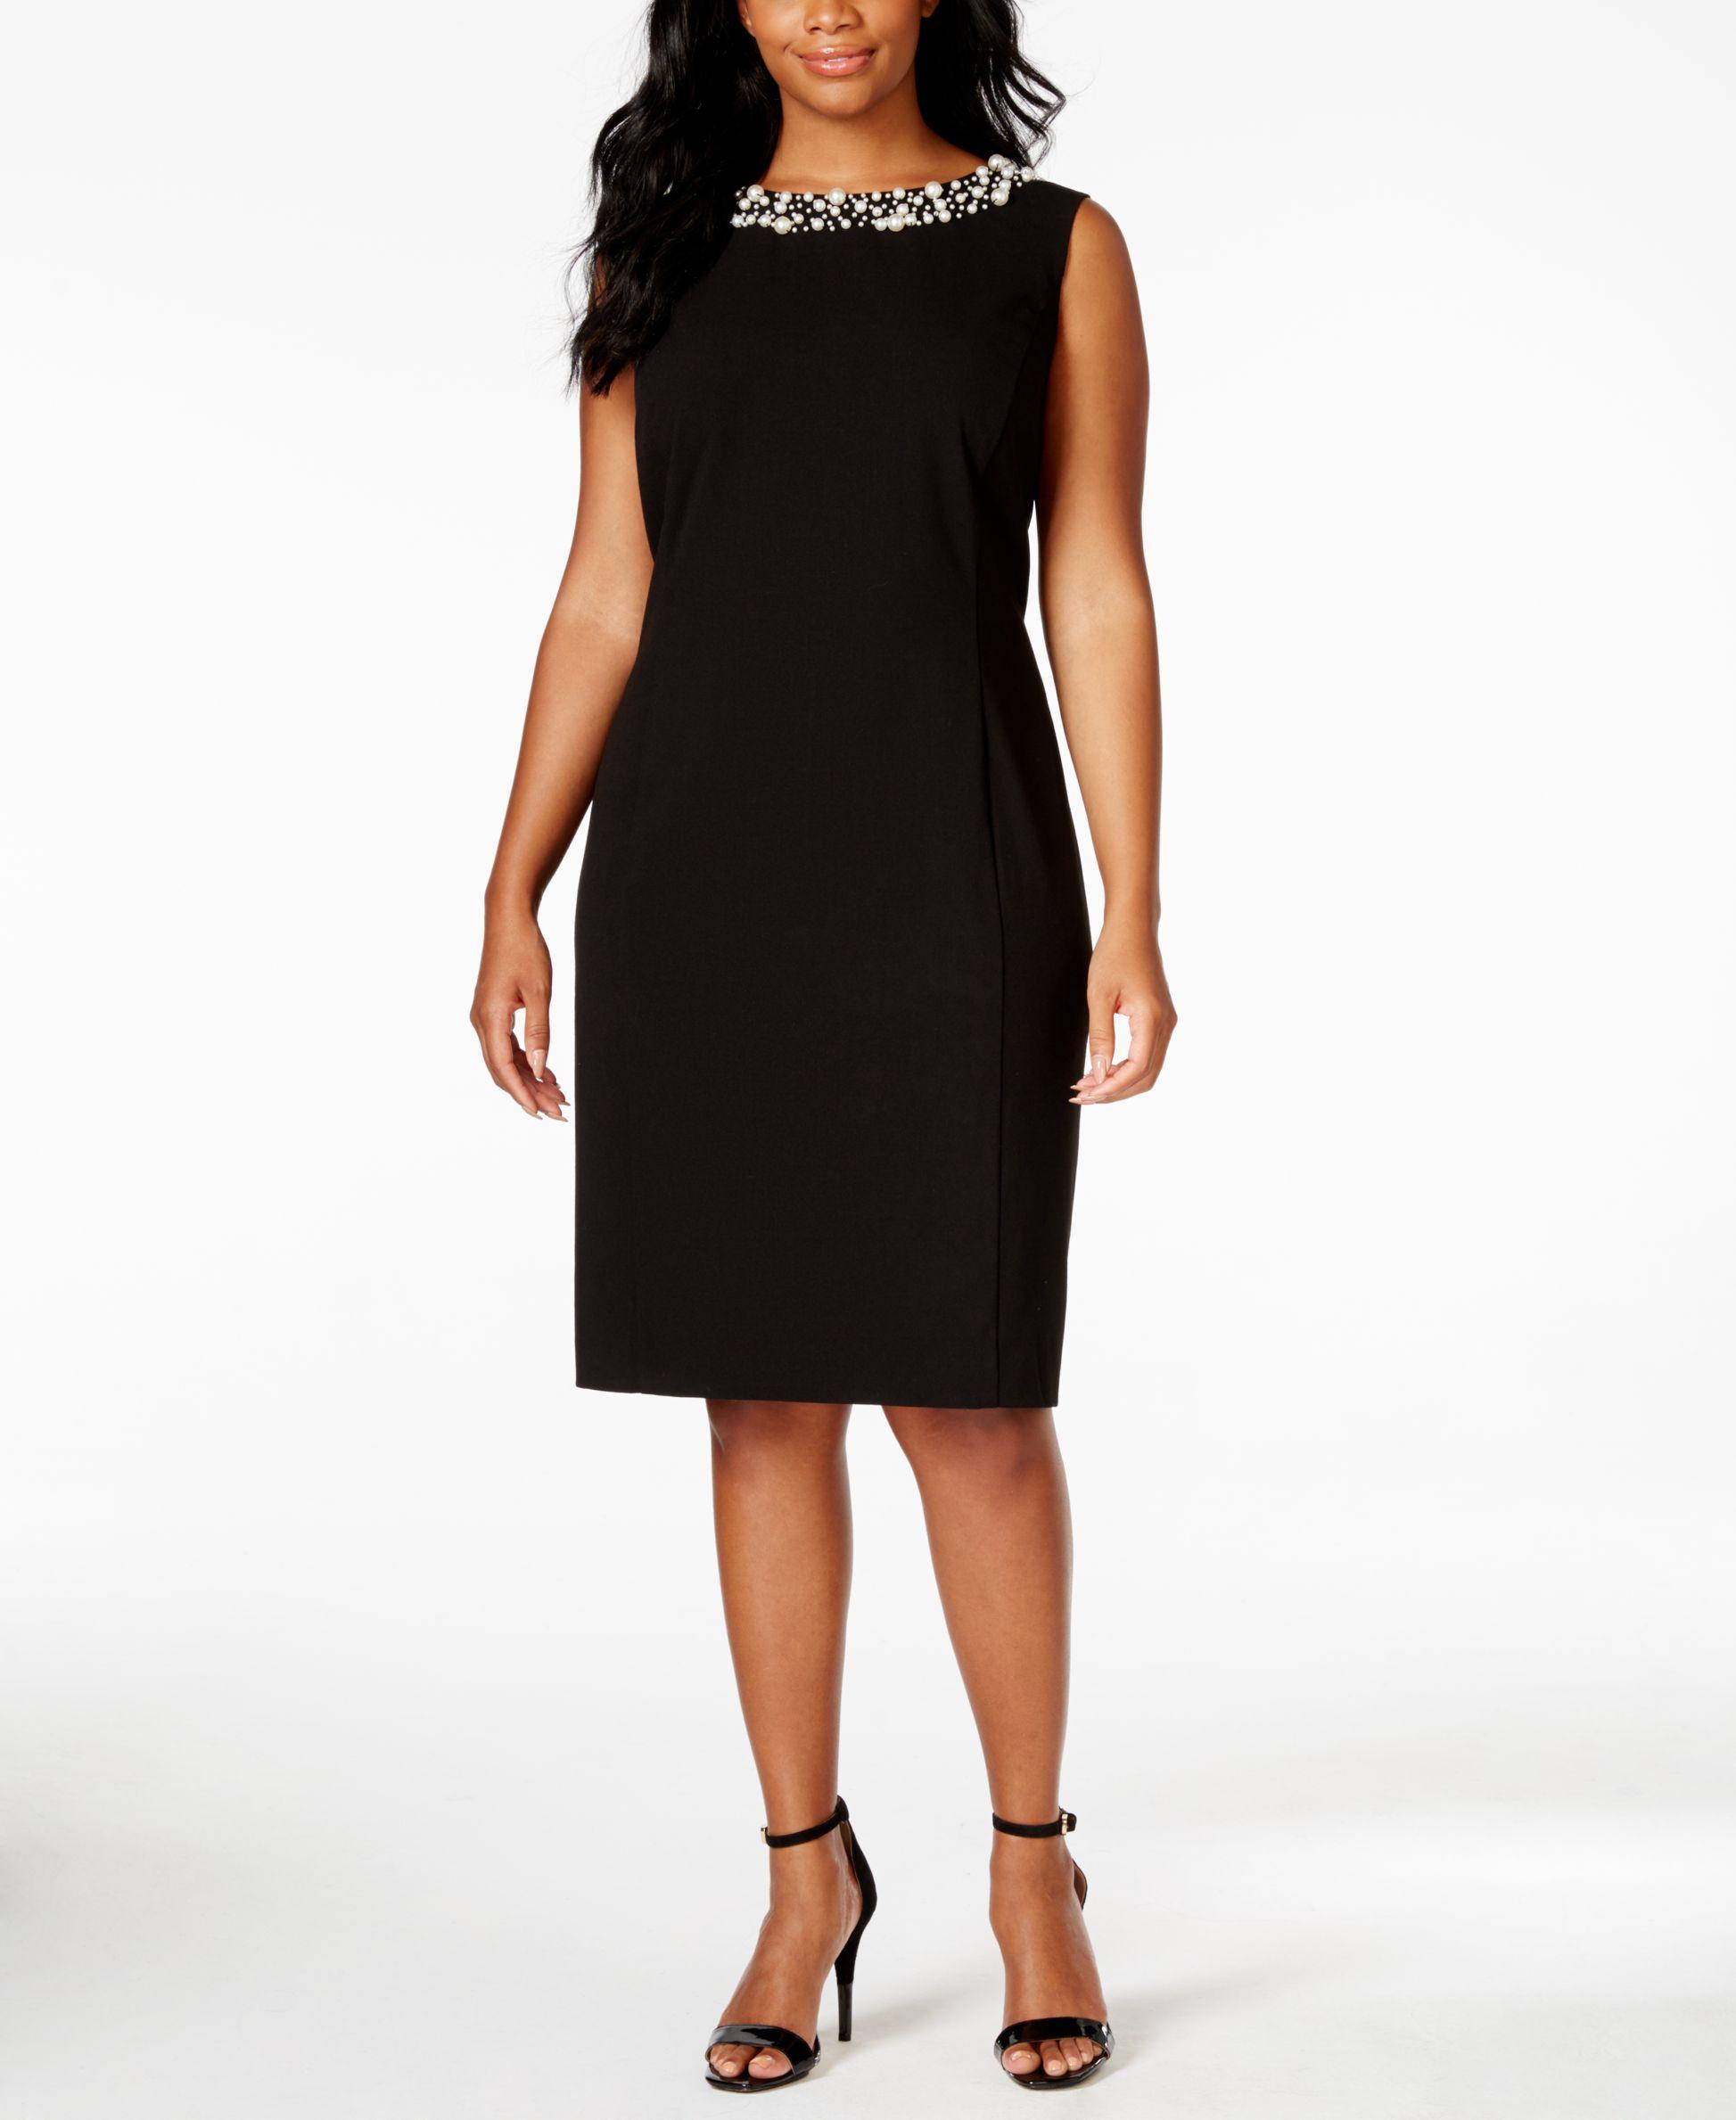 Calvin klein plus size embellished sheath dress in black for Macy black dress wear to wedding